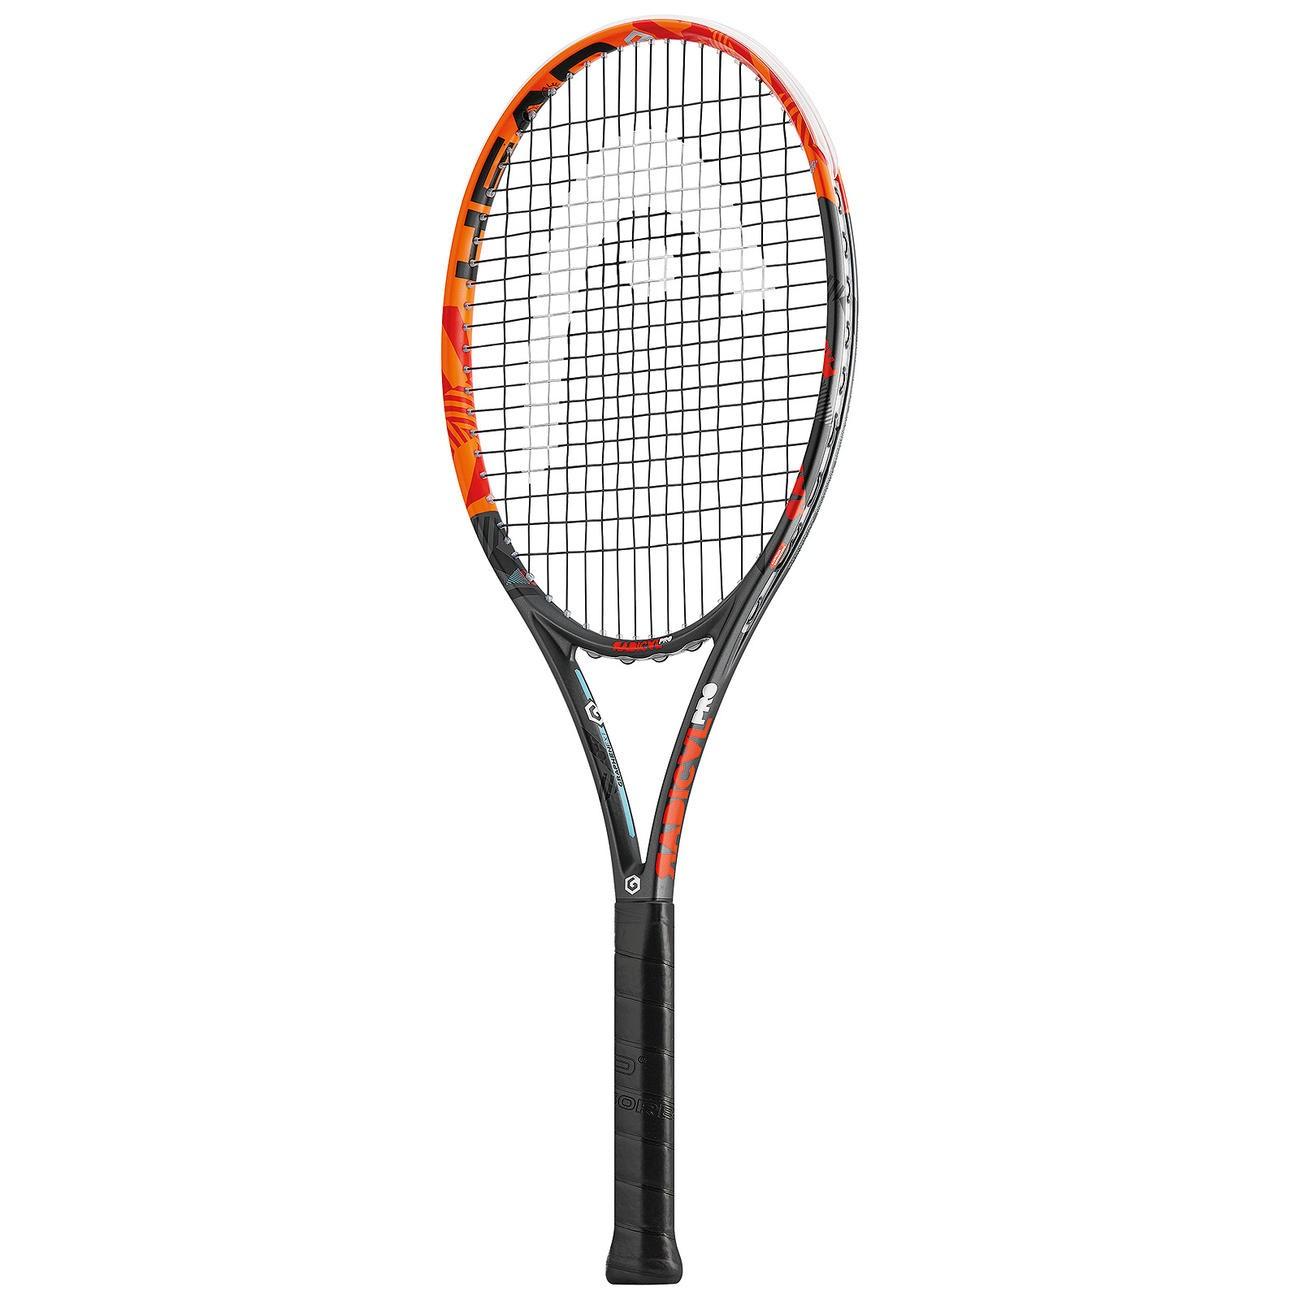 Rakieta tenisowa Head Graphene XT Radical Pro